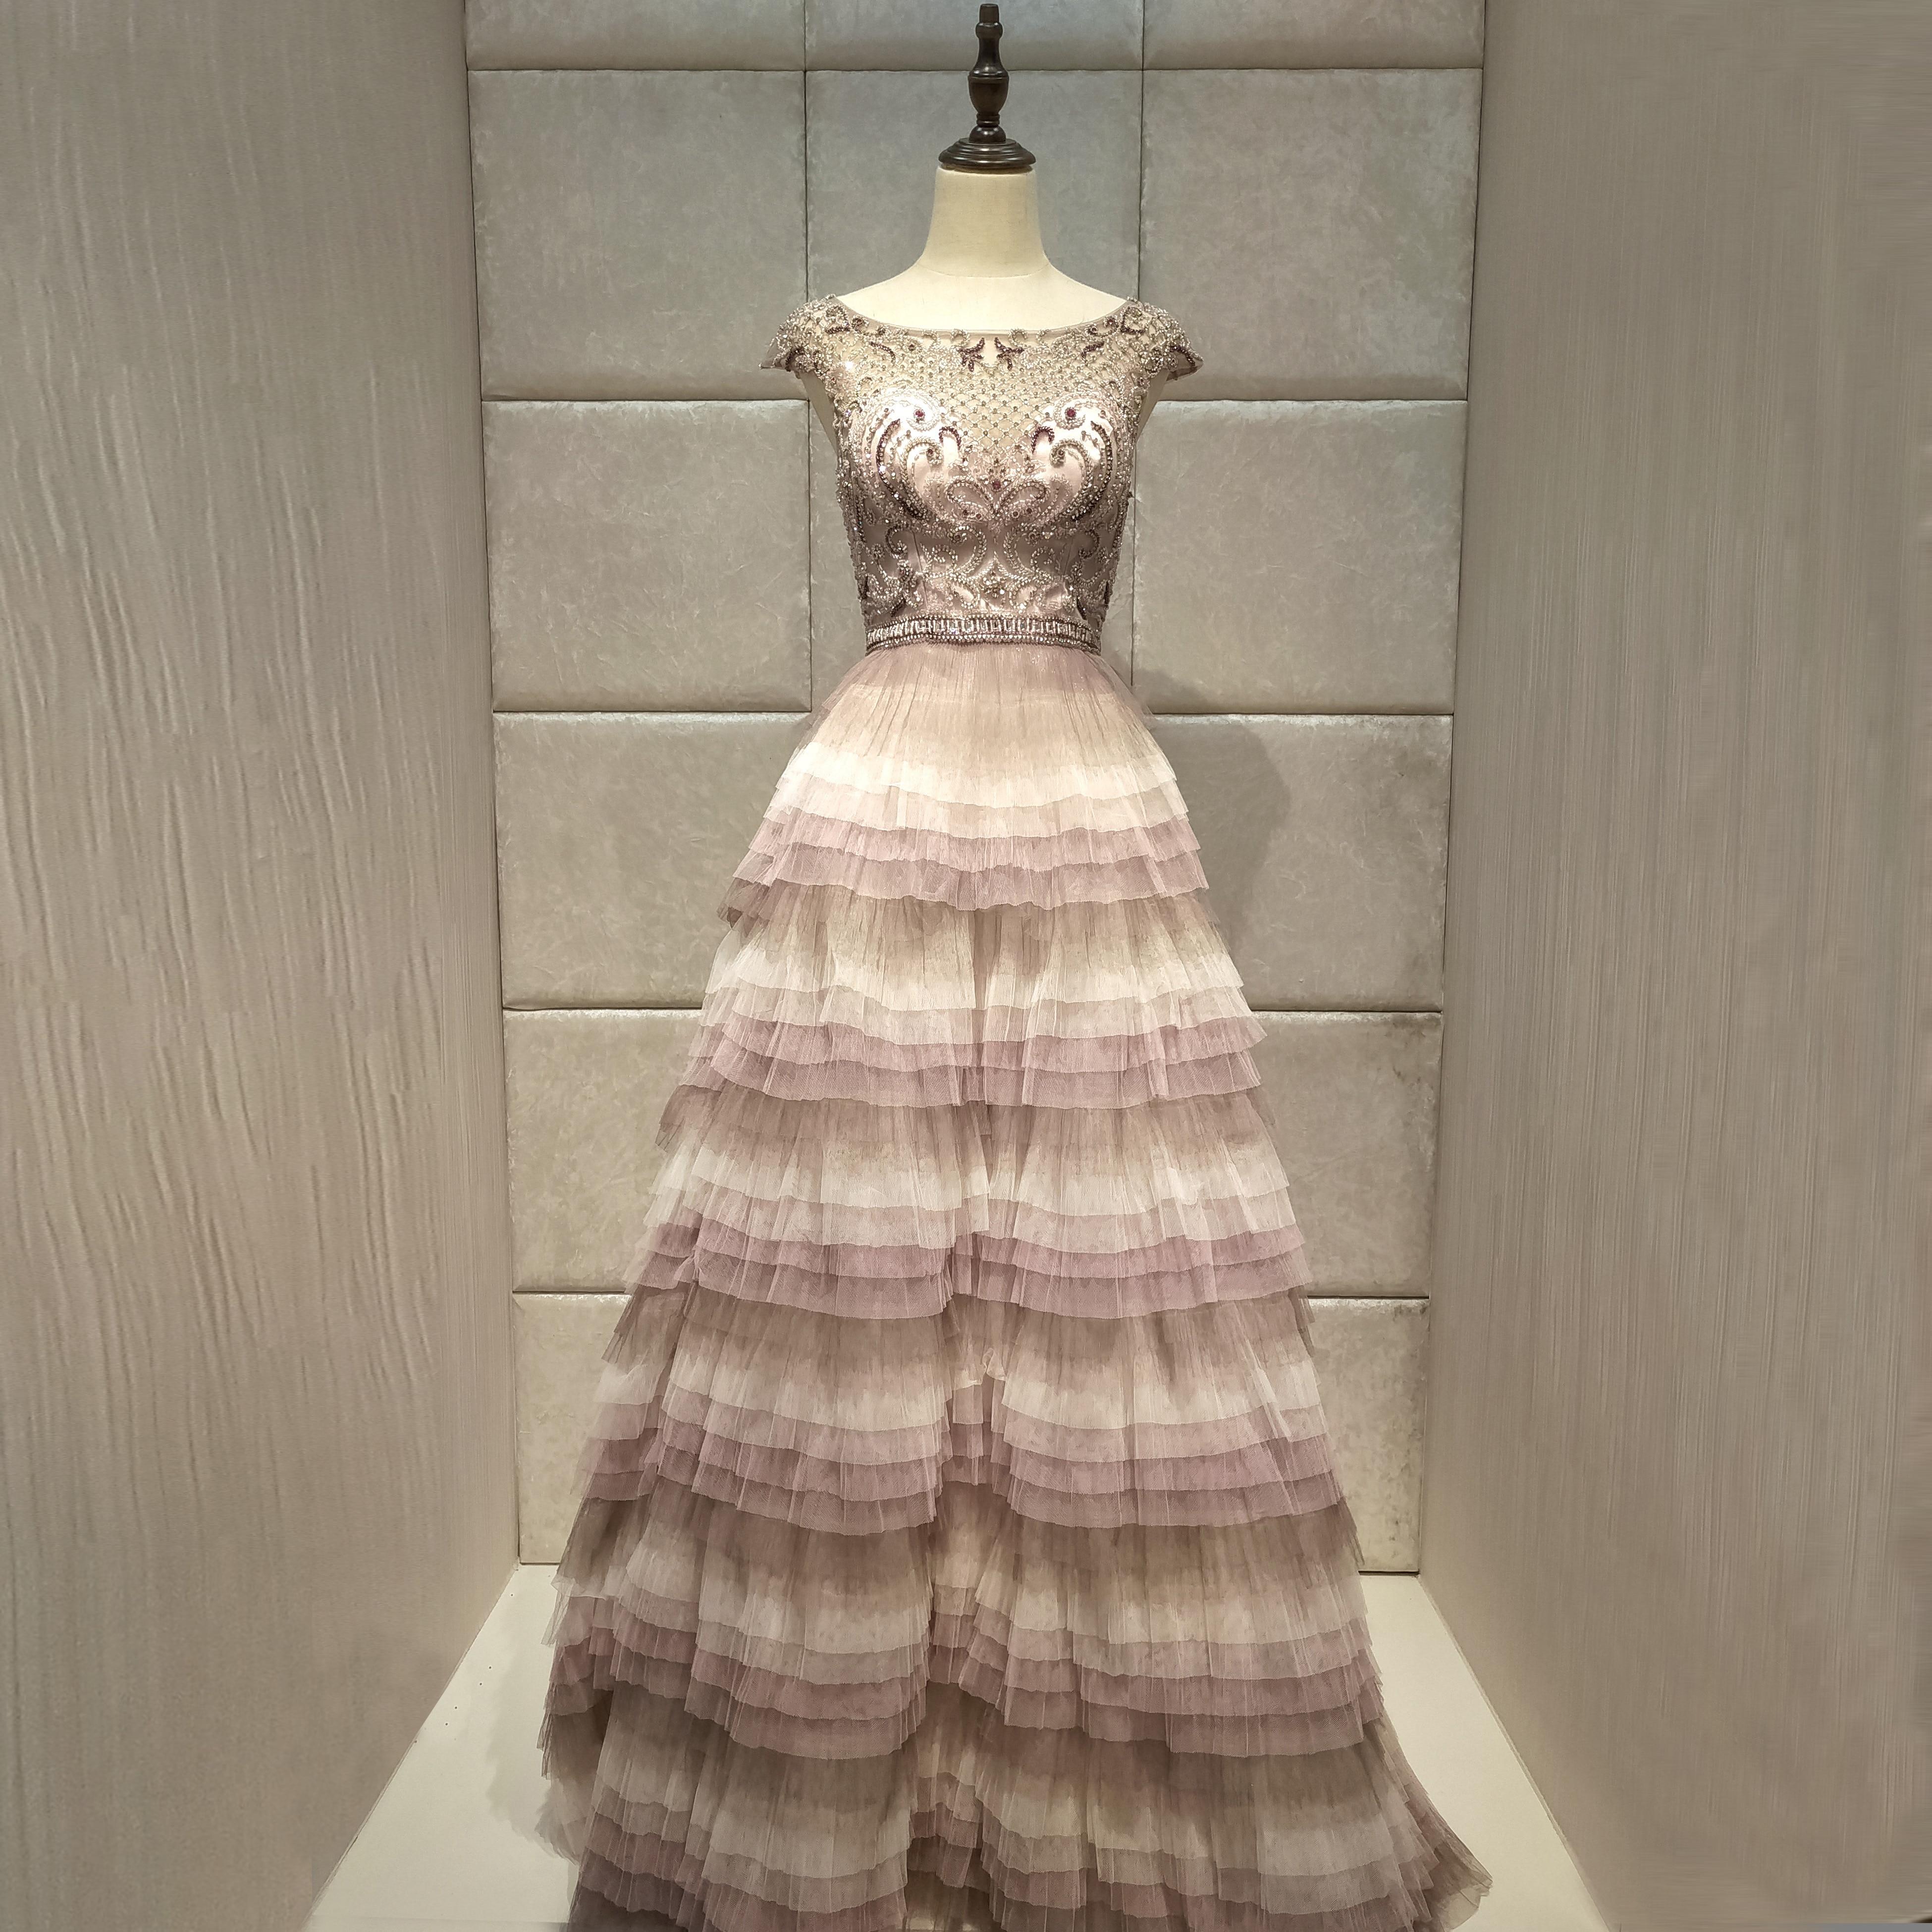 US $18.18 18% OFFlong evening dress robe de soiree formal dress  abendkleider vestidos elegantesEvening Dresses - AliExpress